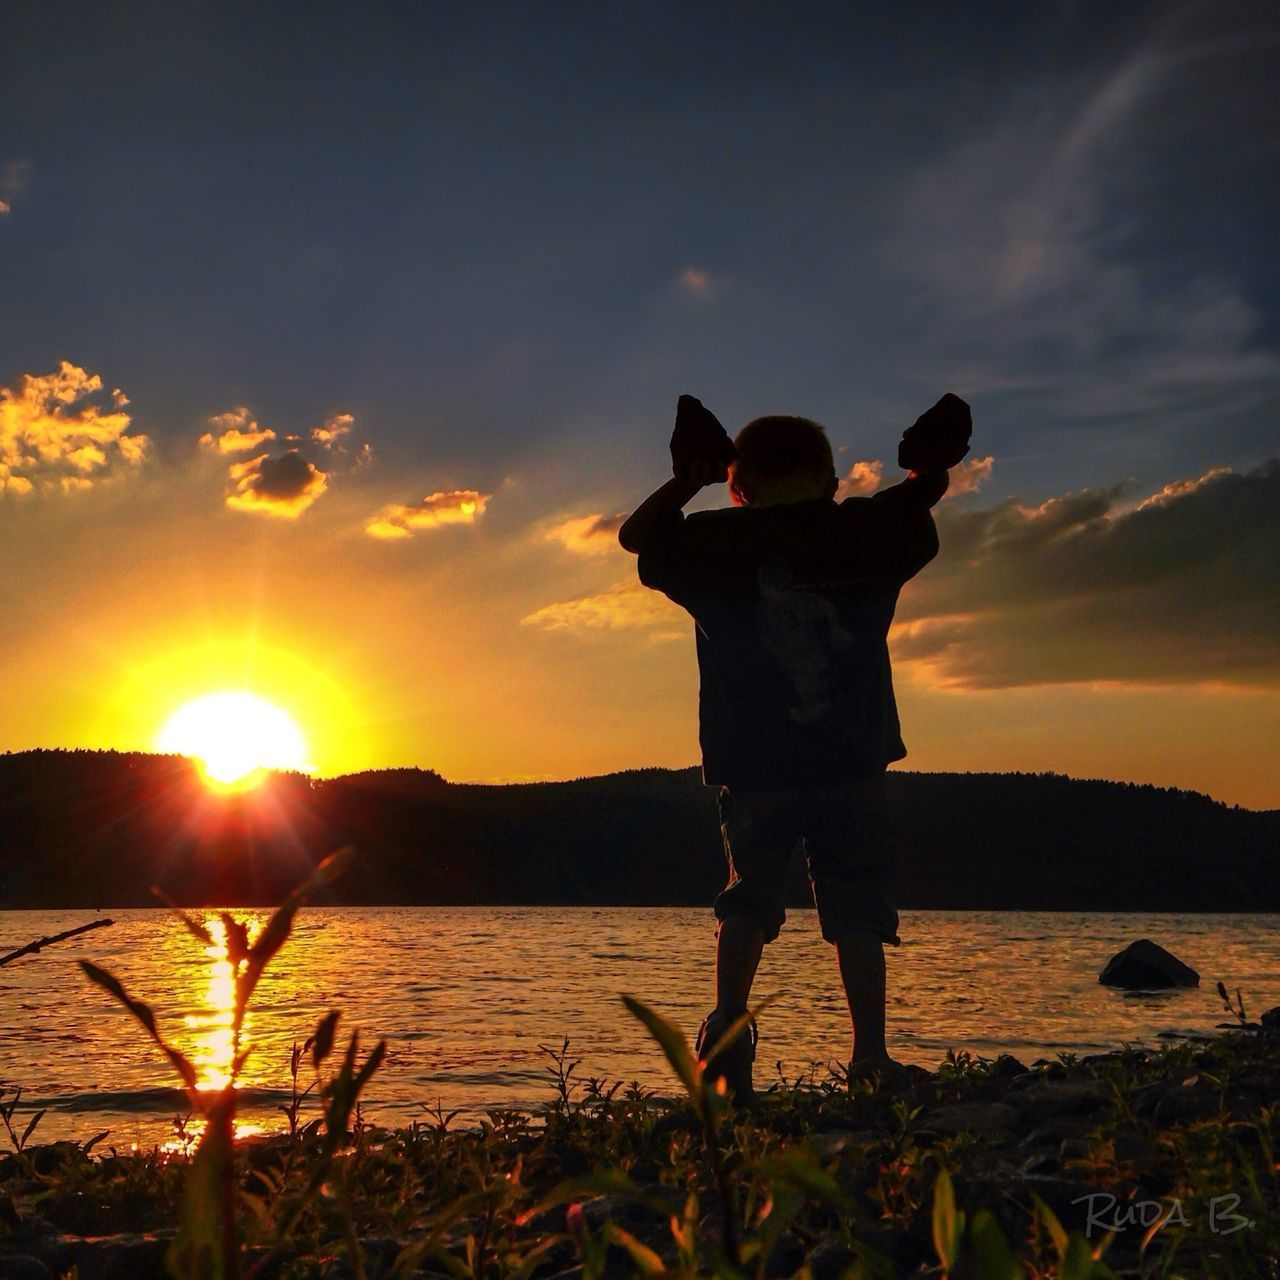 Boy Standing At Lakeshore During Sunset